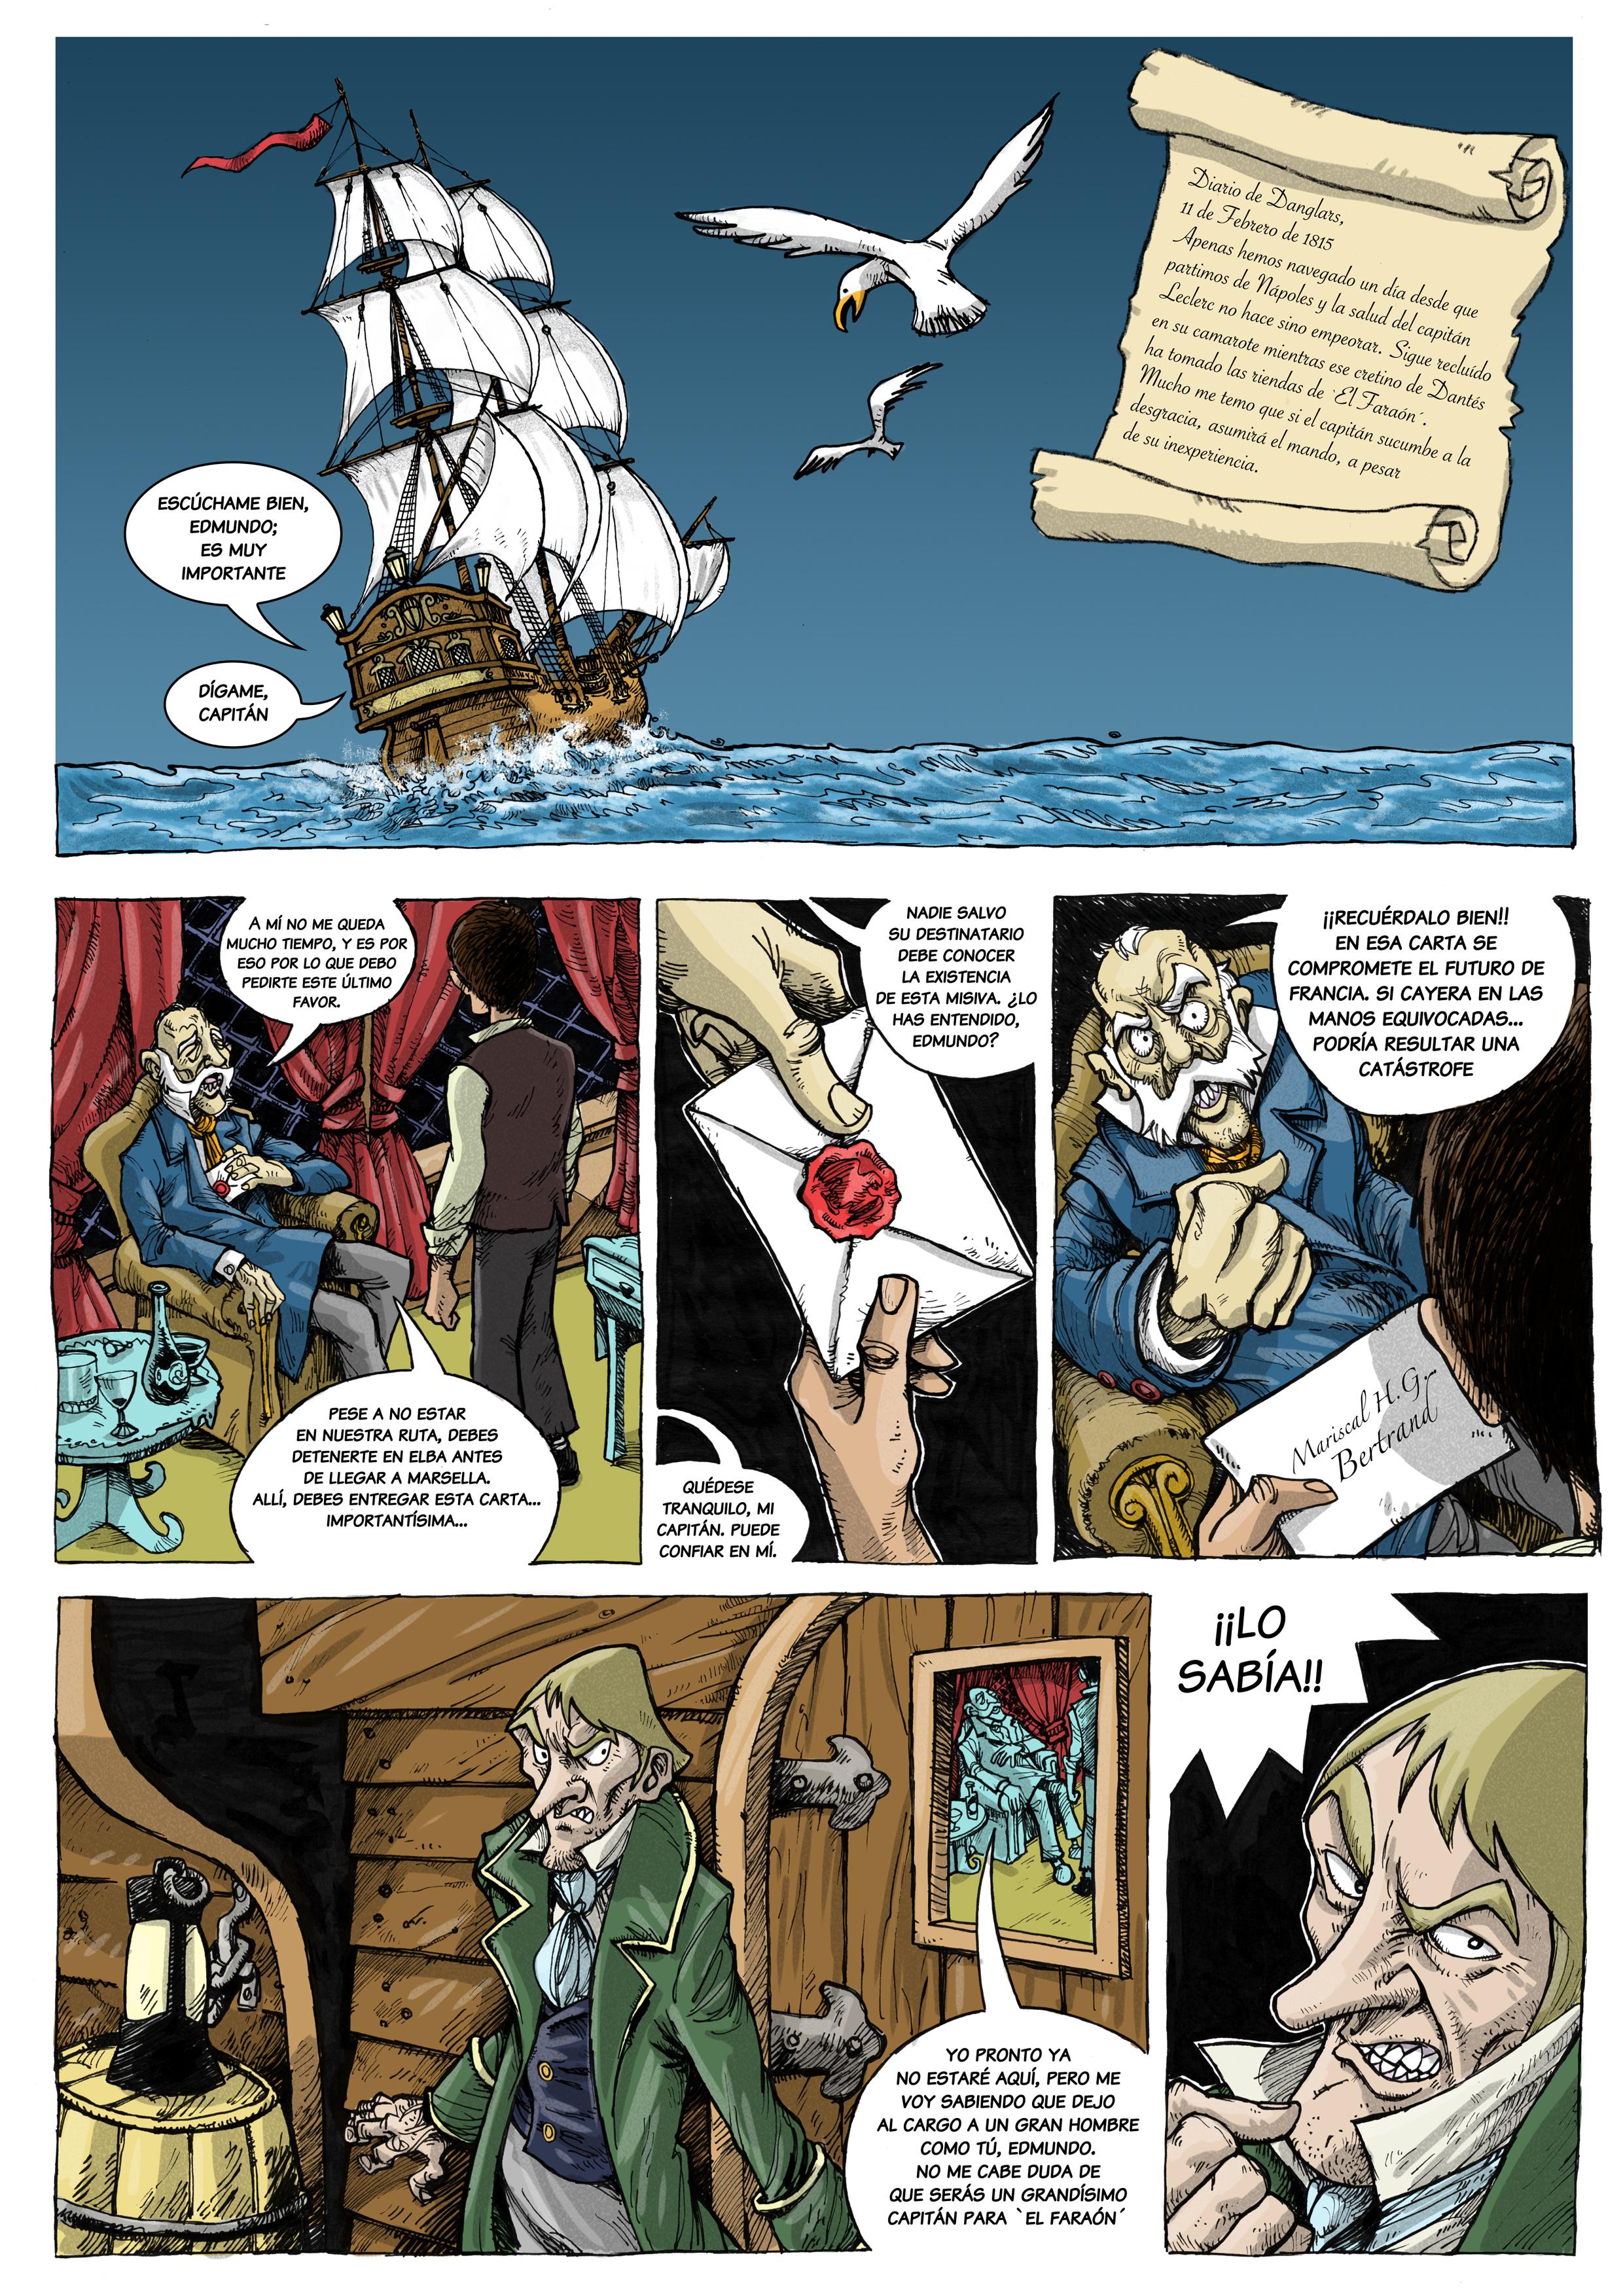 Montecristo Página 01